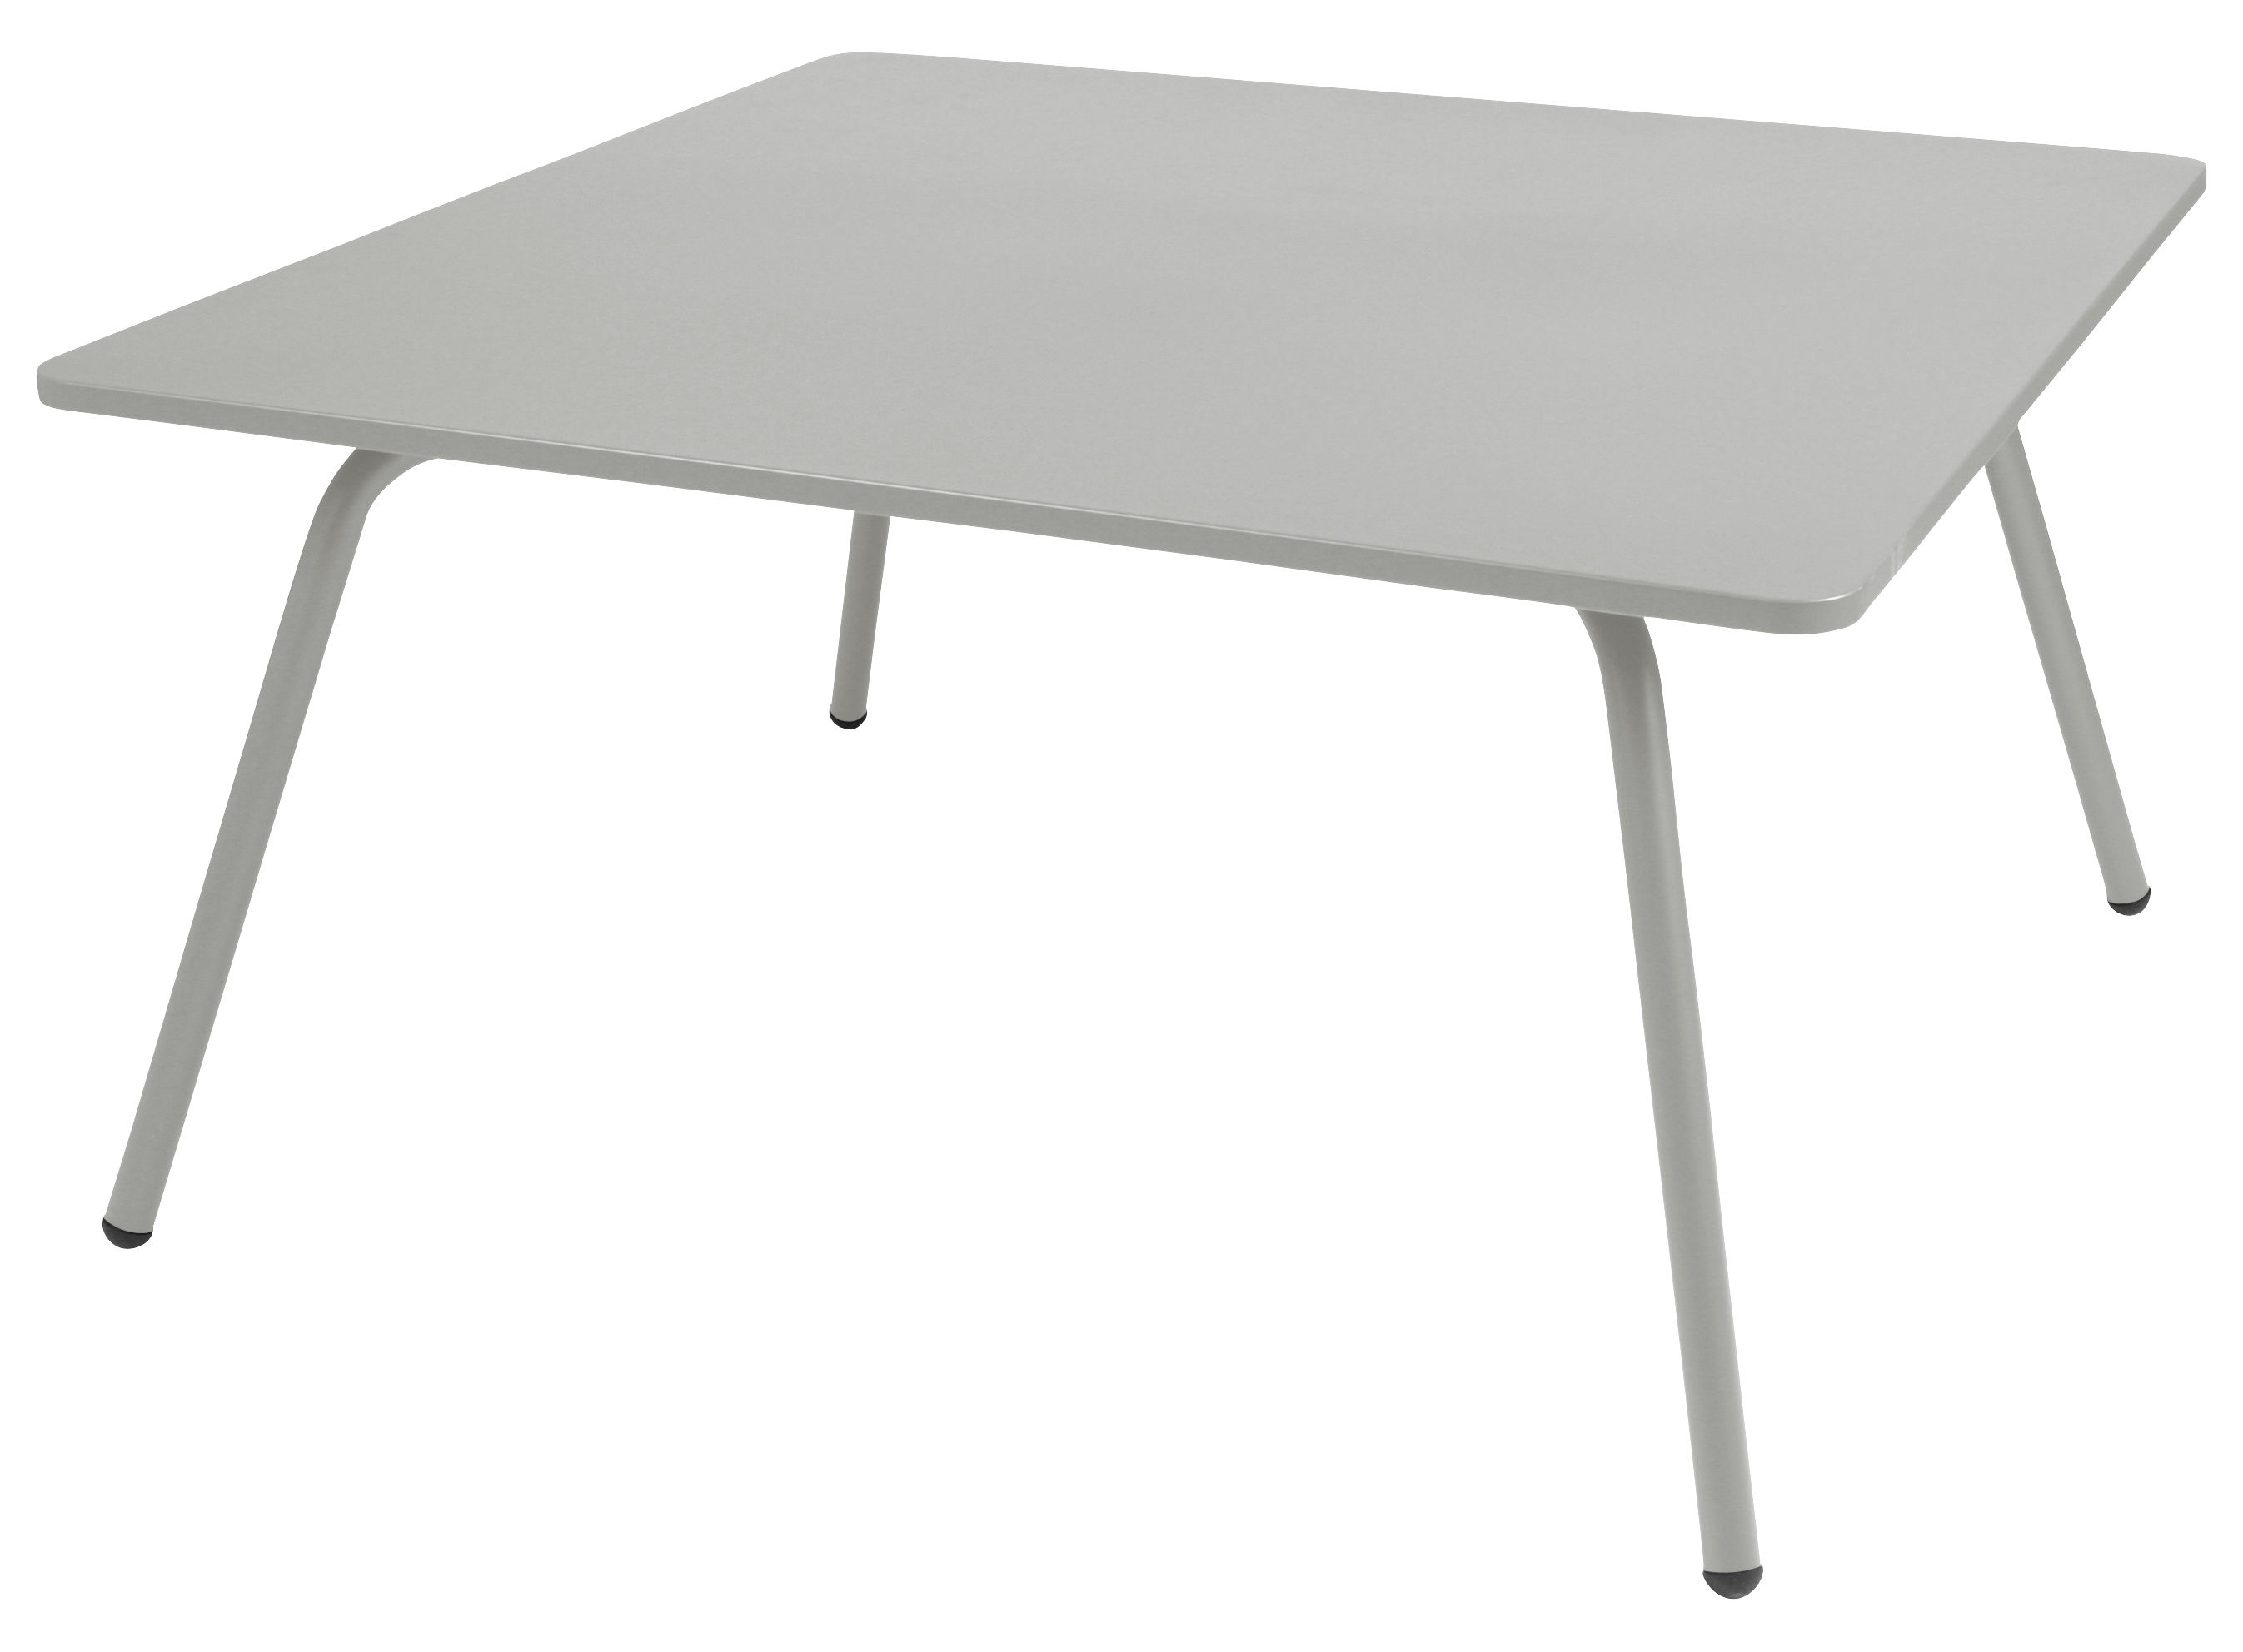 Table Cosmo / 143 x 143 cm Gris métal - Fermob